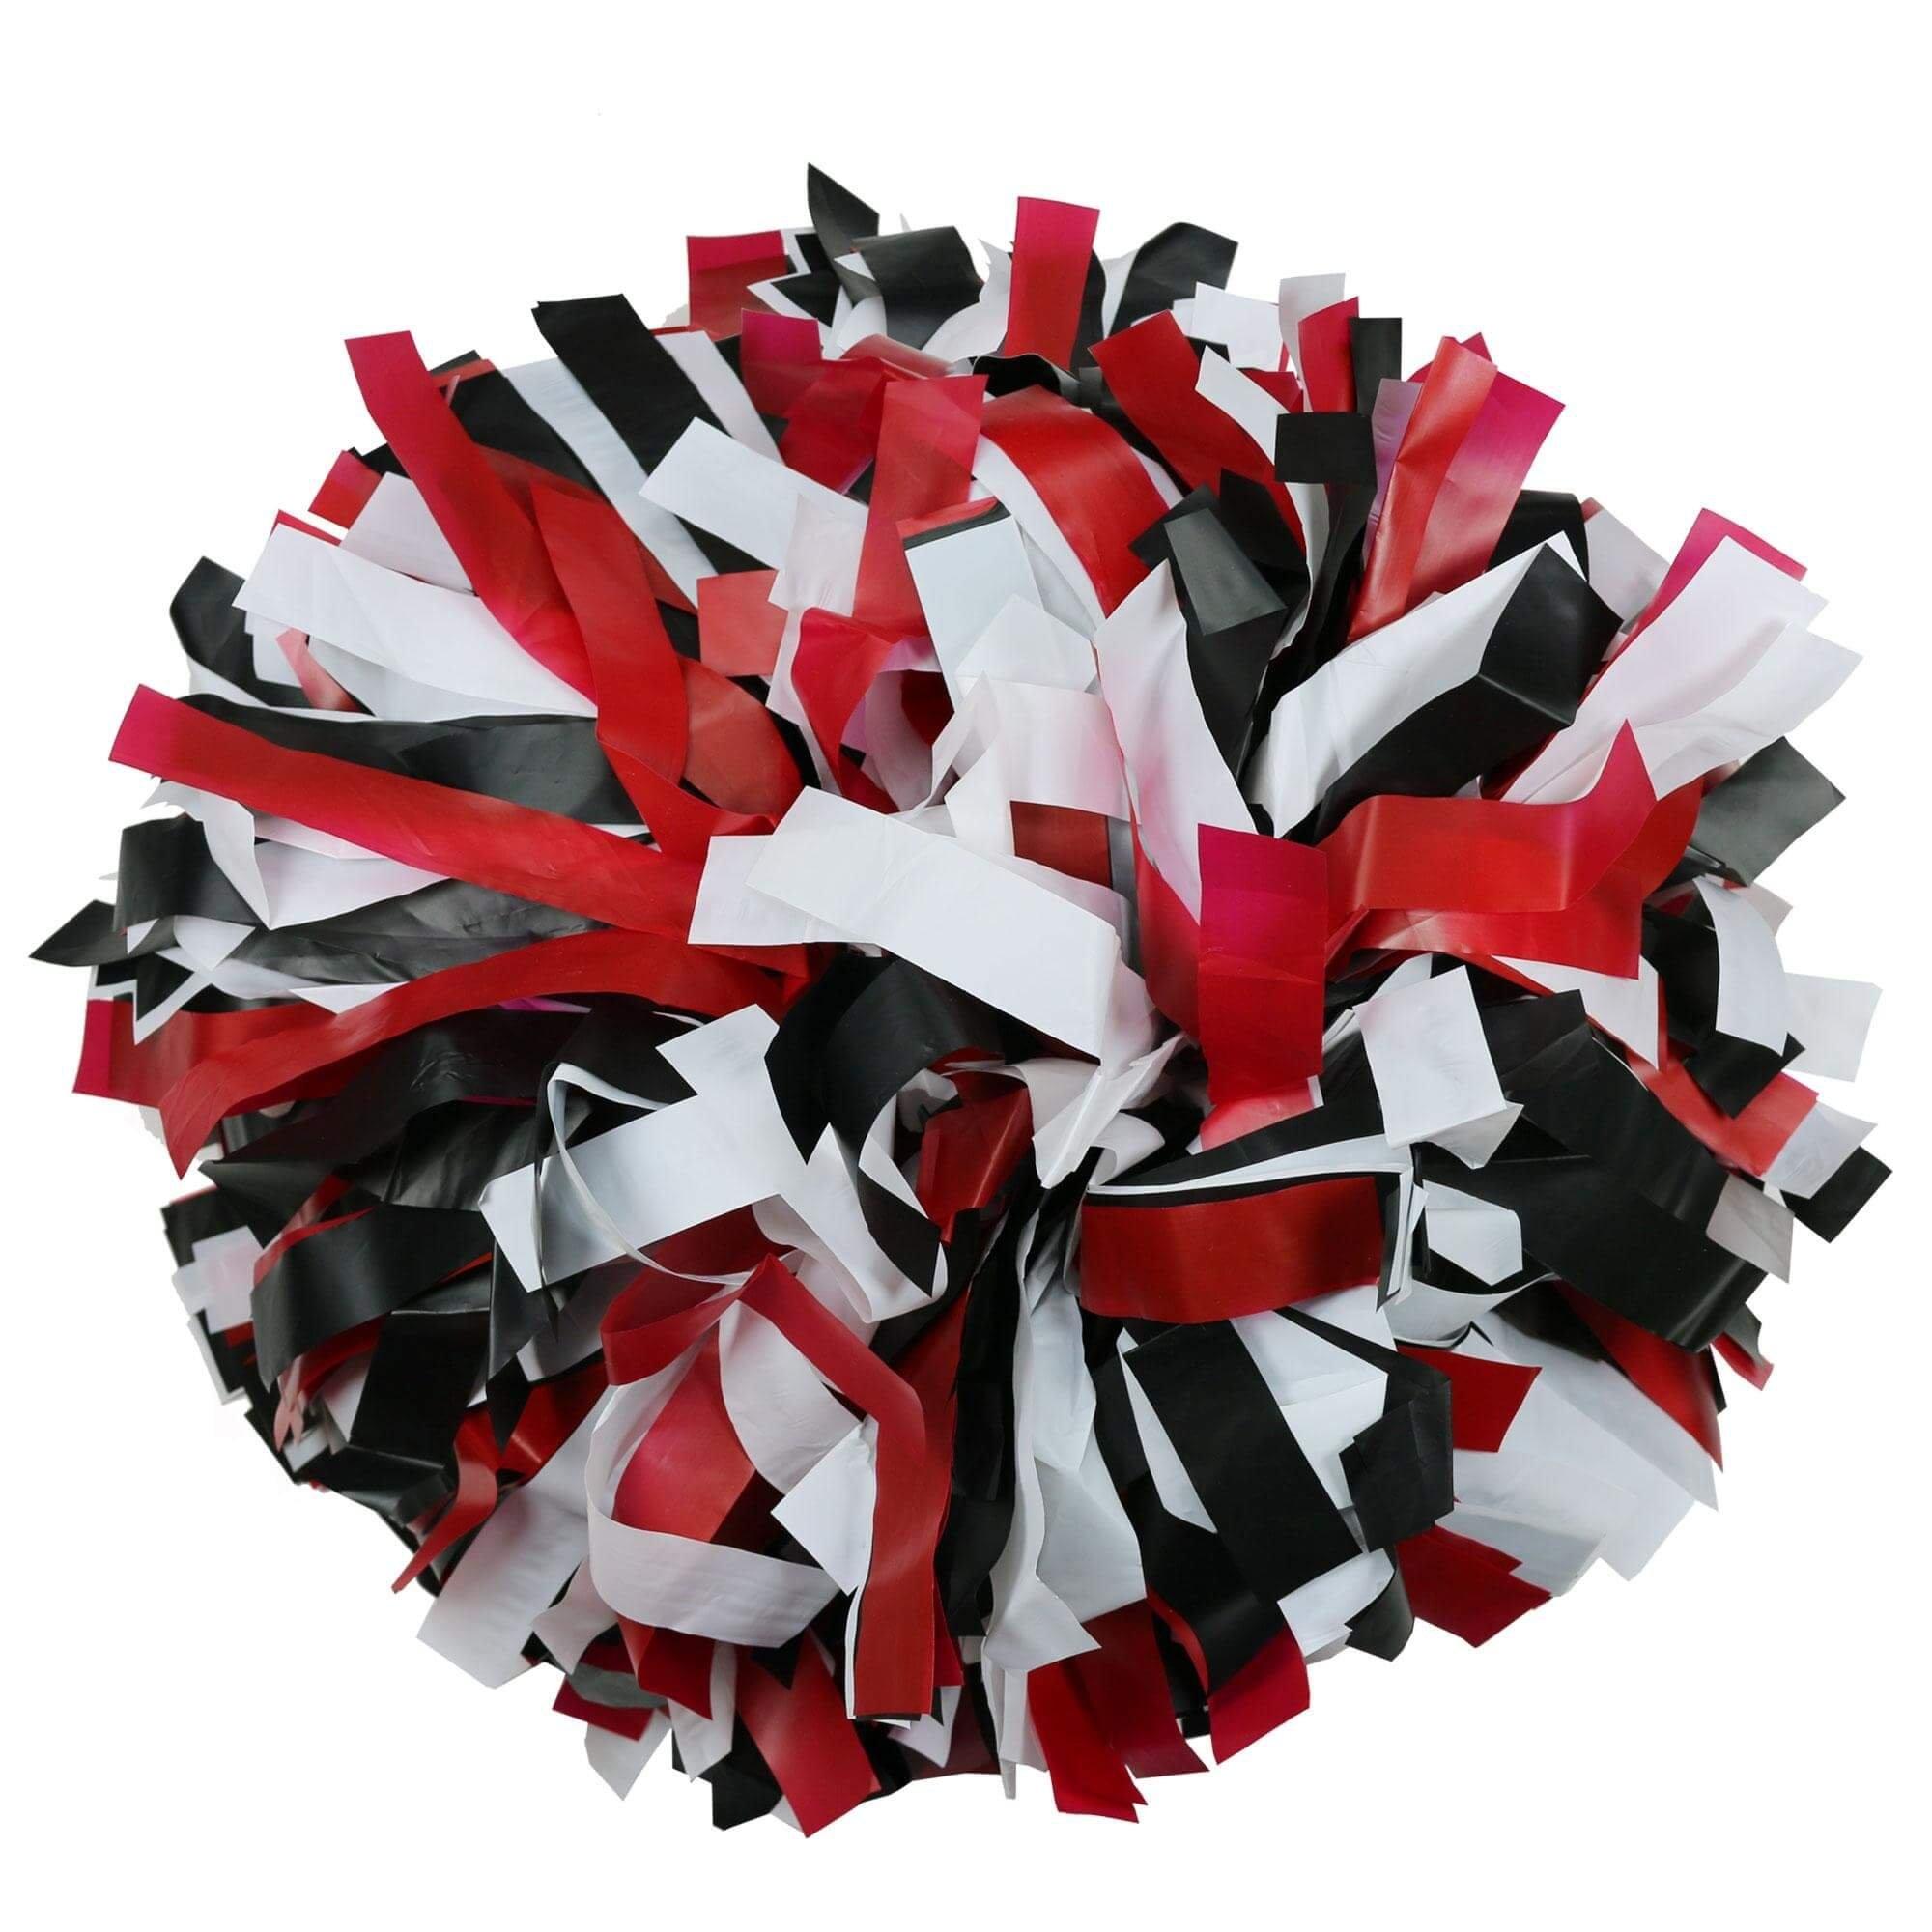 Danzcue Baton Handle Black/red/white Plastic Poms - One Pair